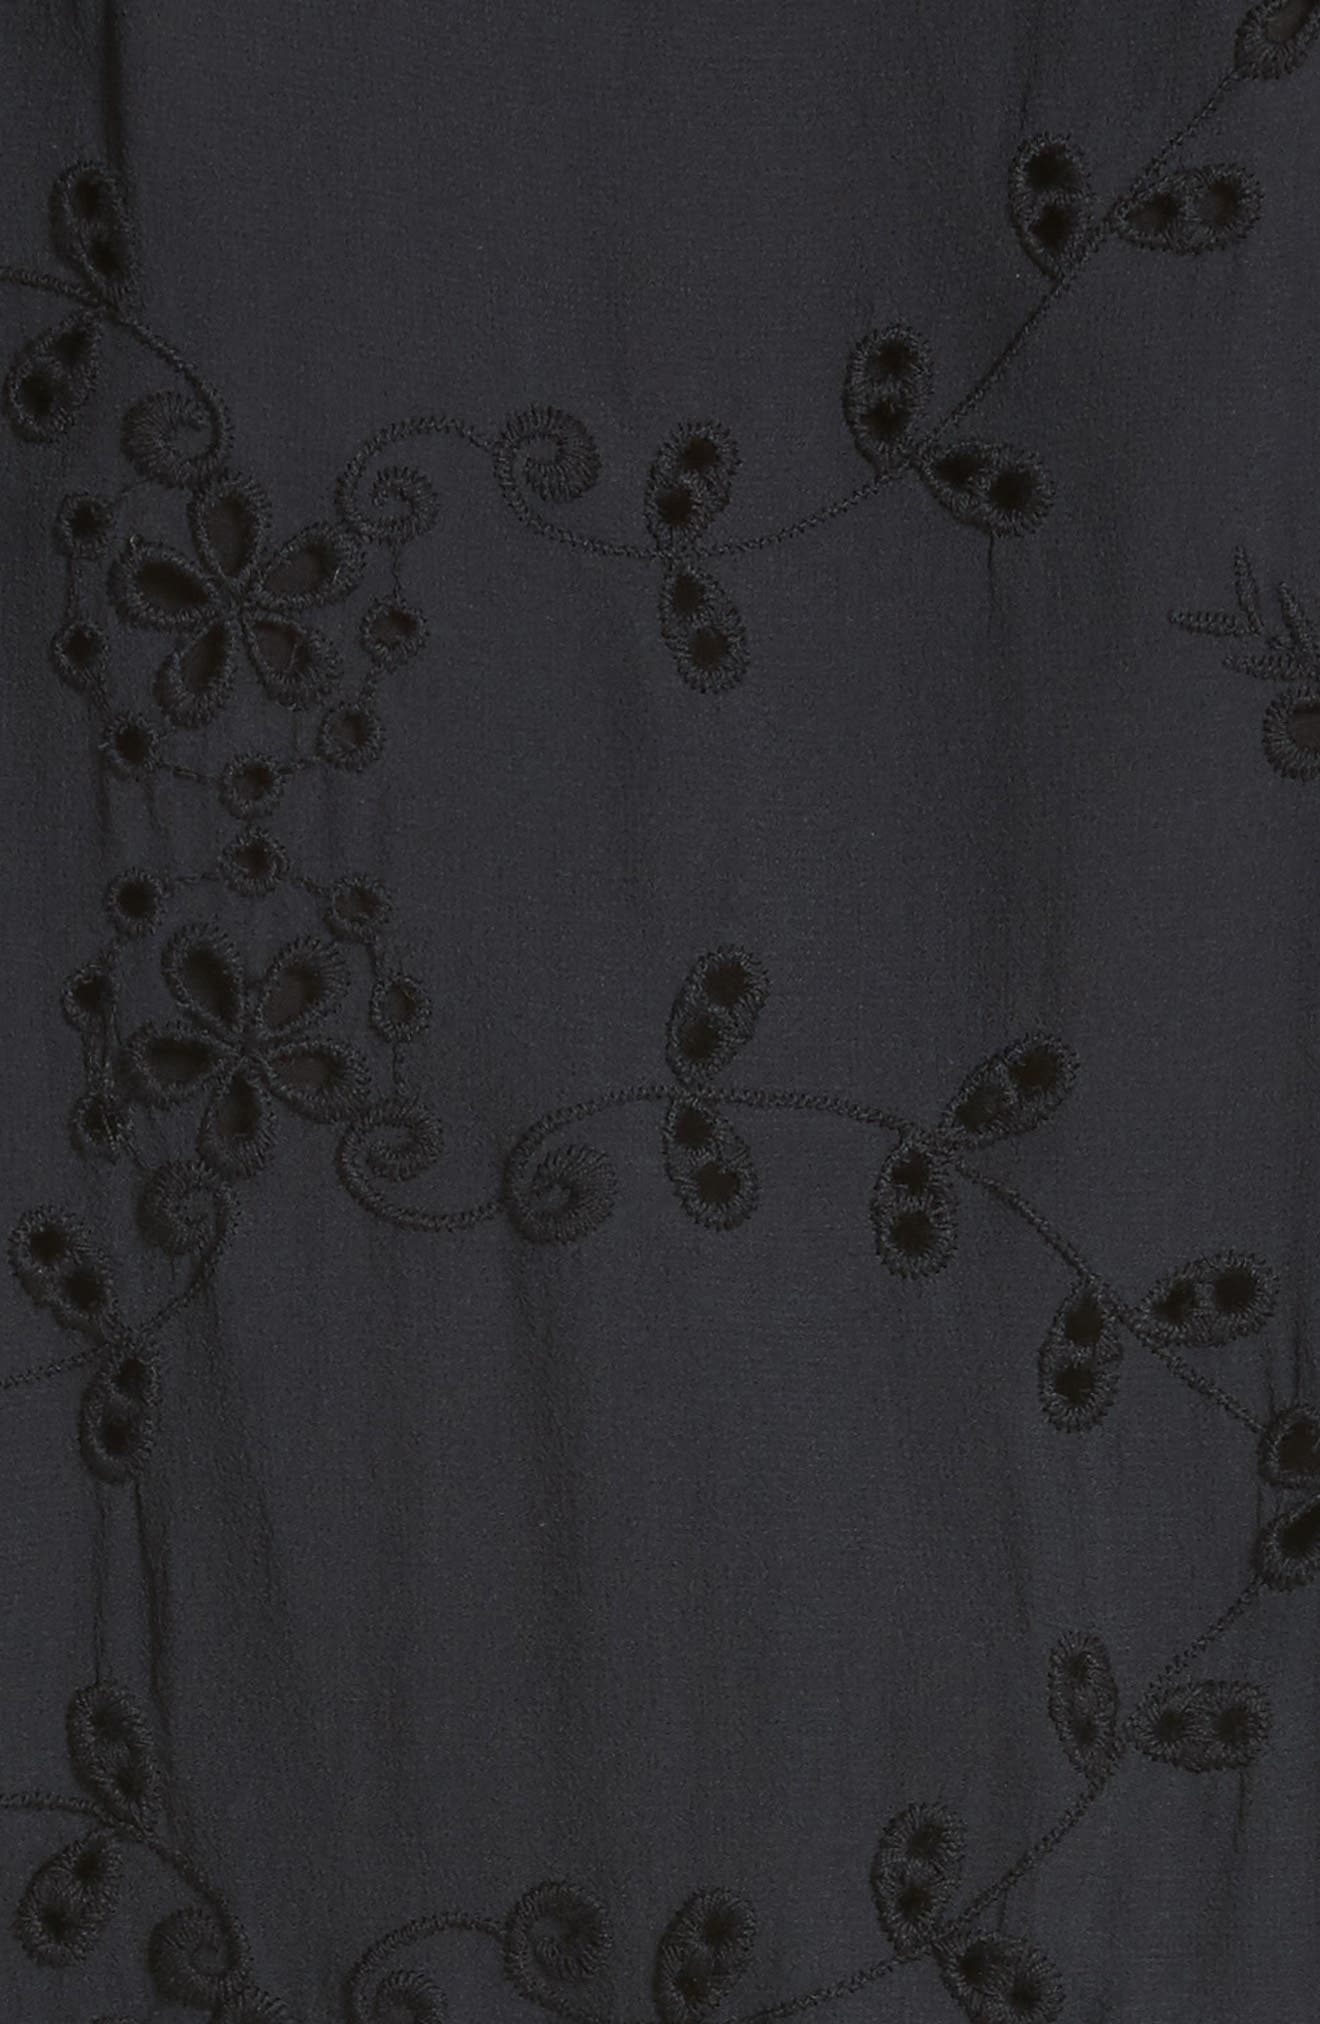 Alpheus Cold Shoulder Ruffled Silk Dress,                             Alternate thumbnail 5, color,                             008